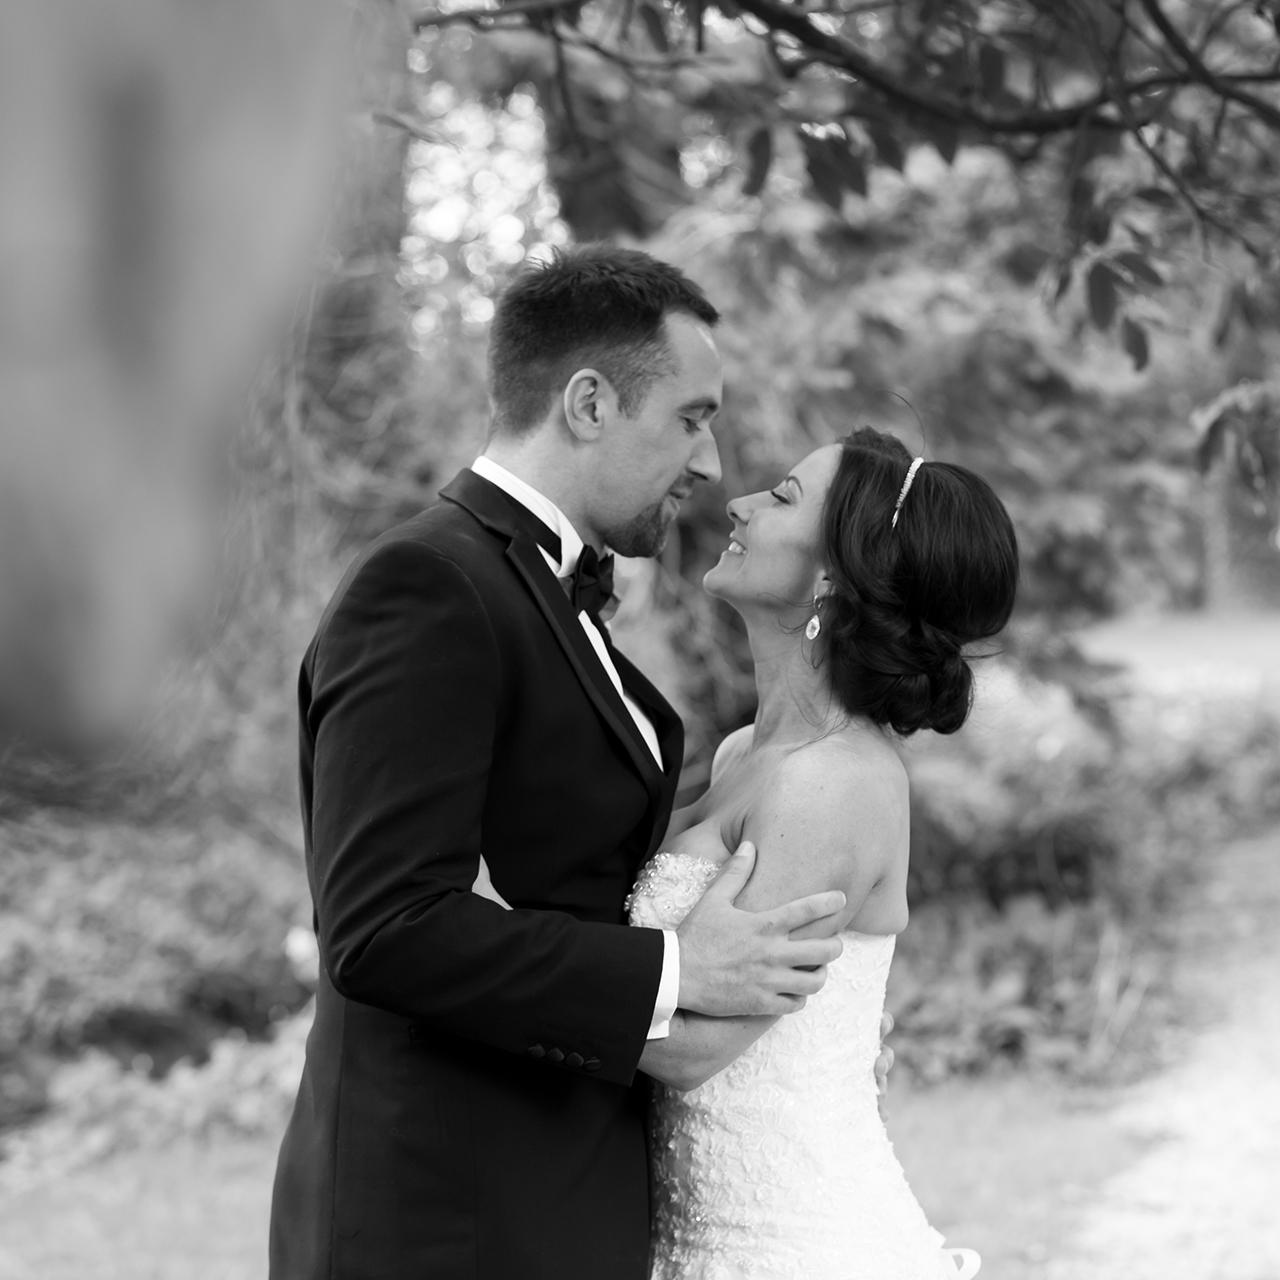 Traci Habergham Photography Mitton Hall Clitheroe Wedding